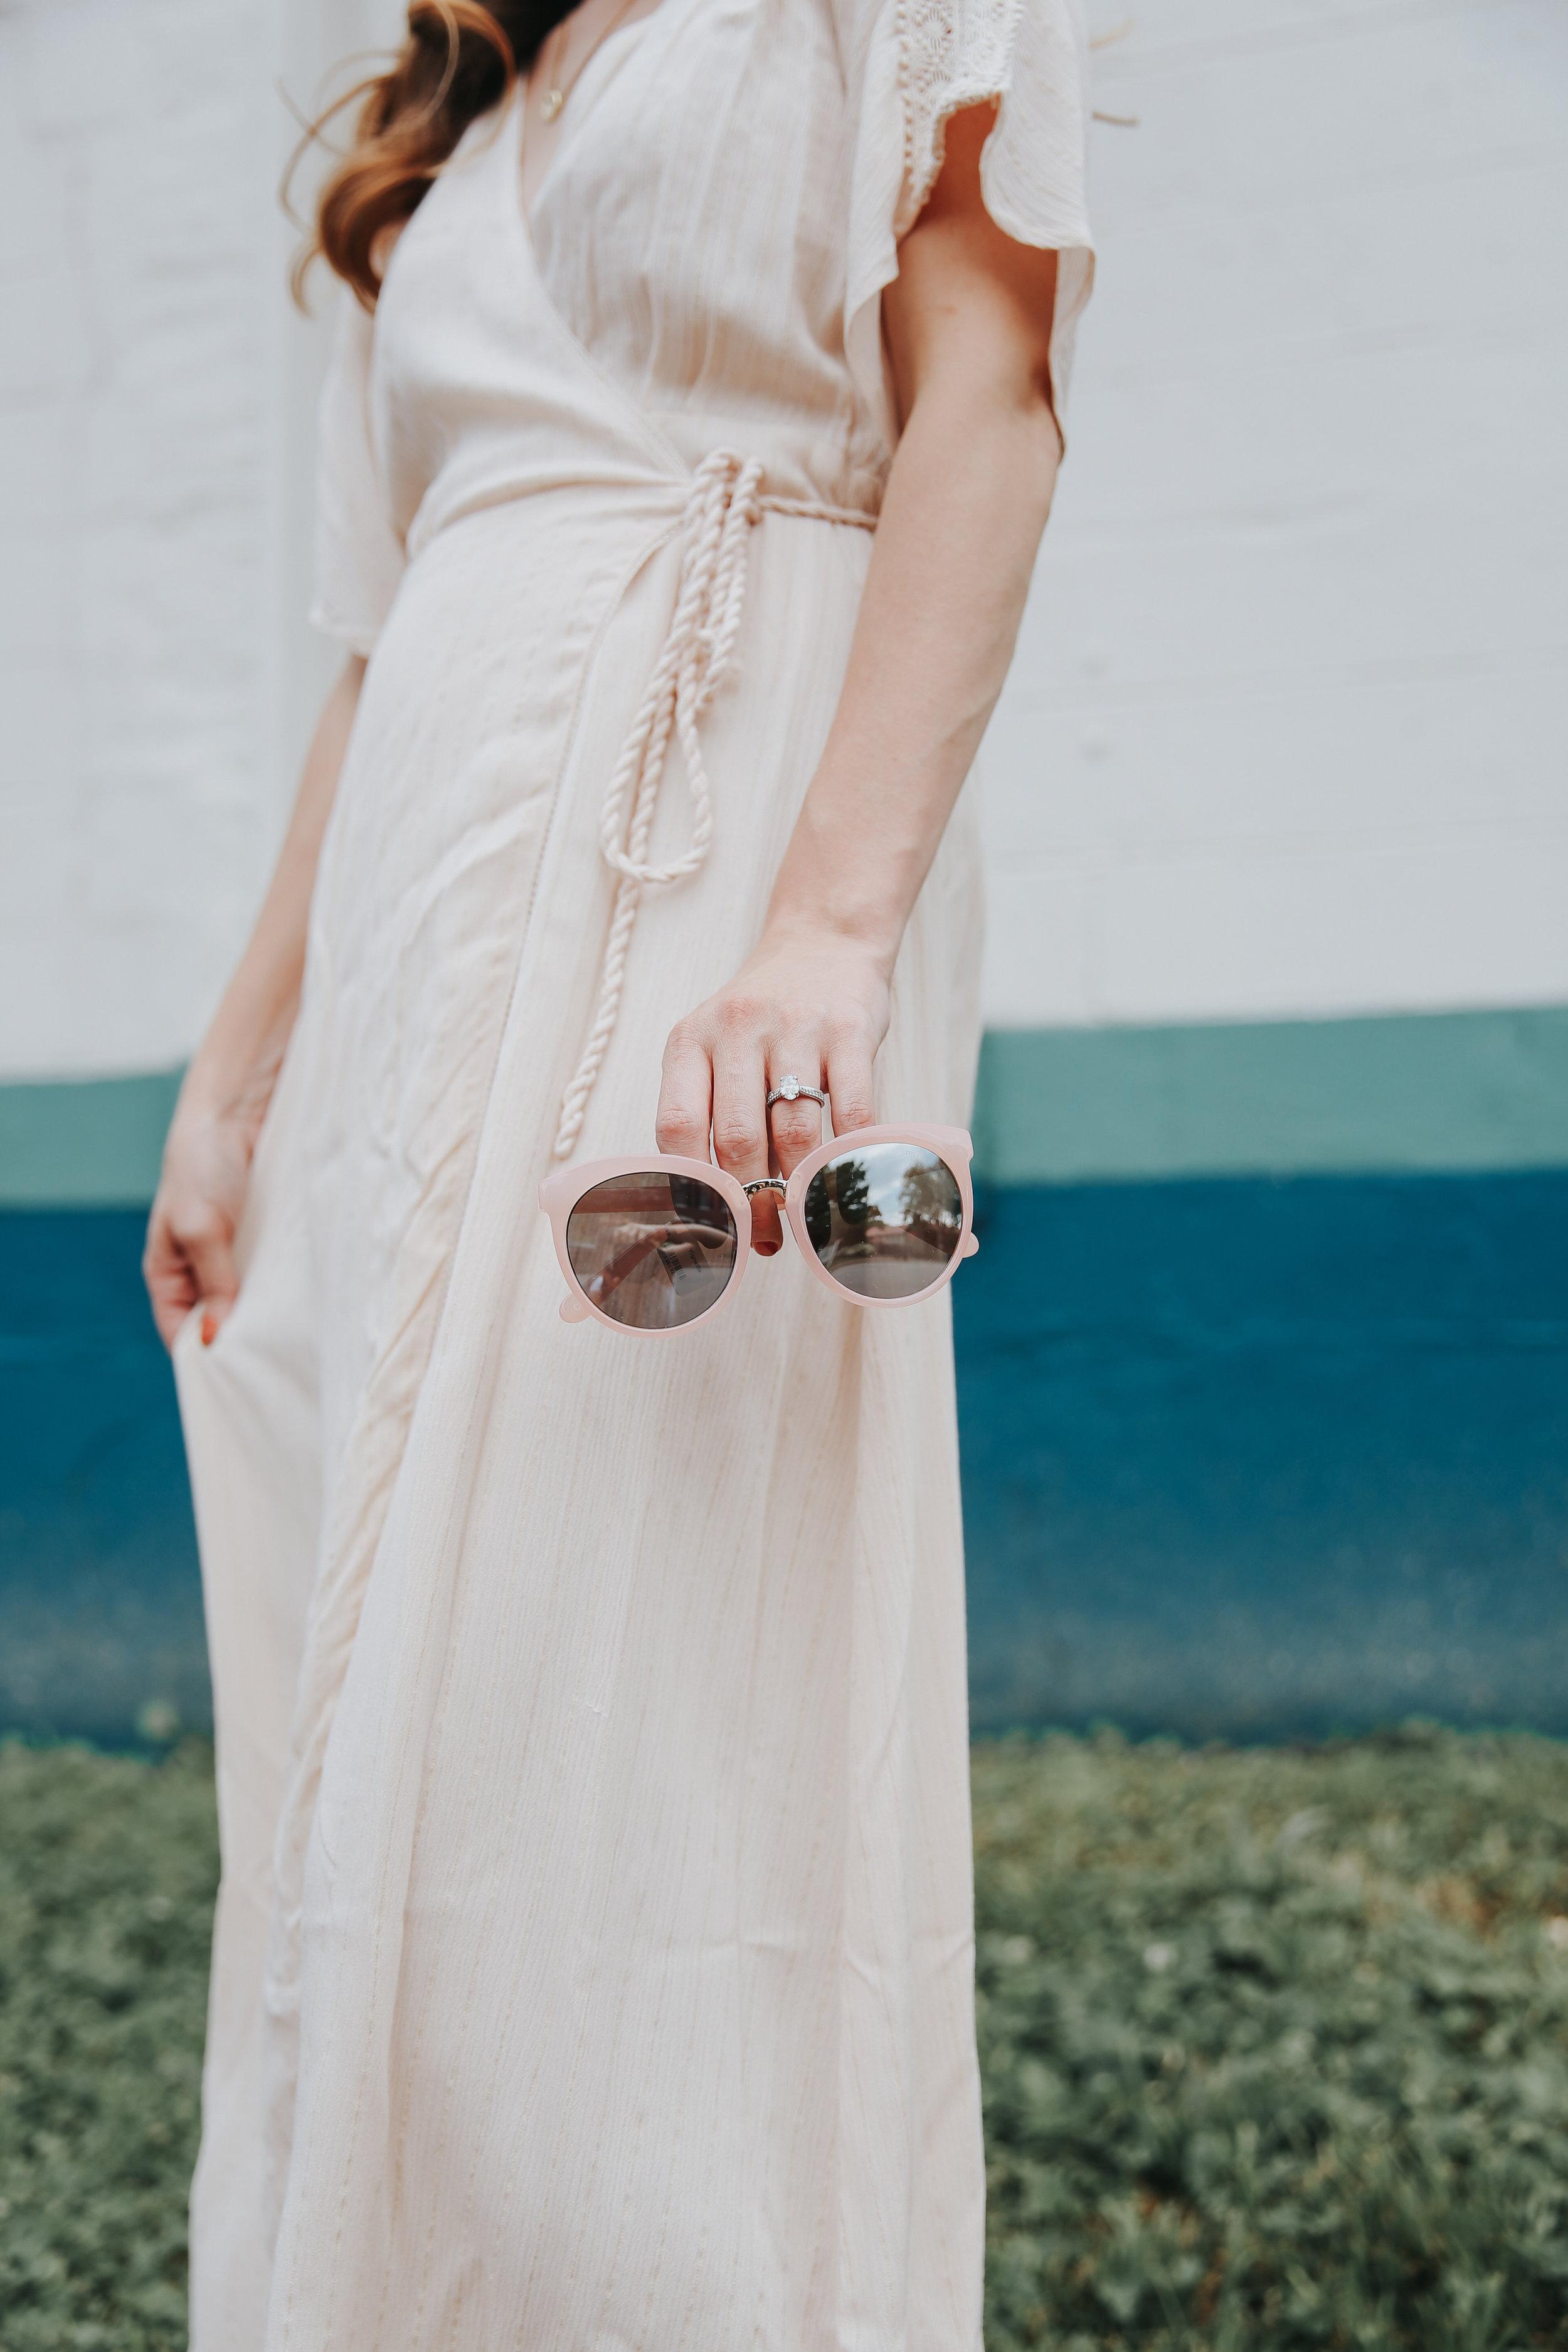 Boutique women's dress and sunglasses